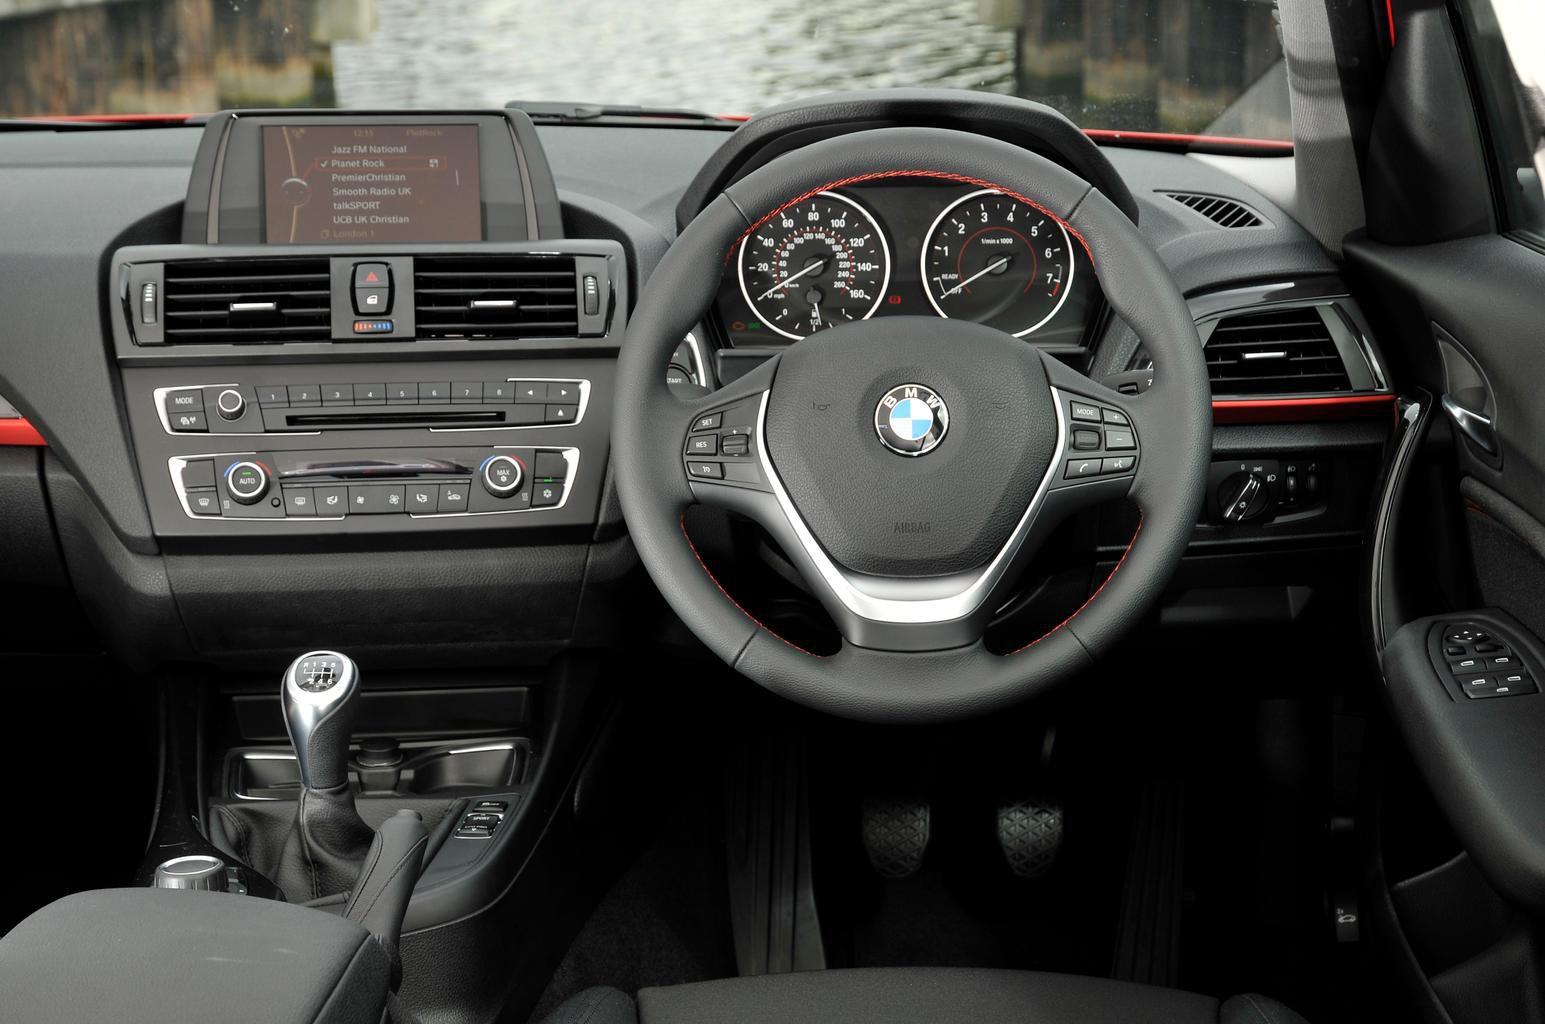 Used test – premium unleaded: BMW 1 Series vs Volkswagen Golf